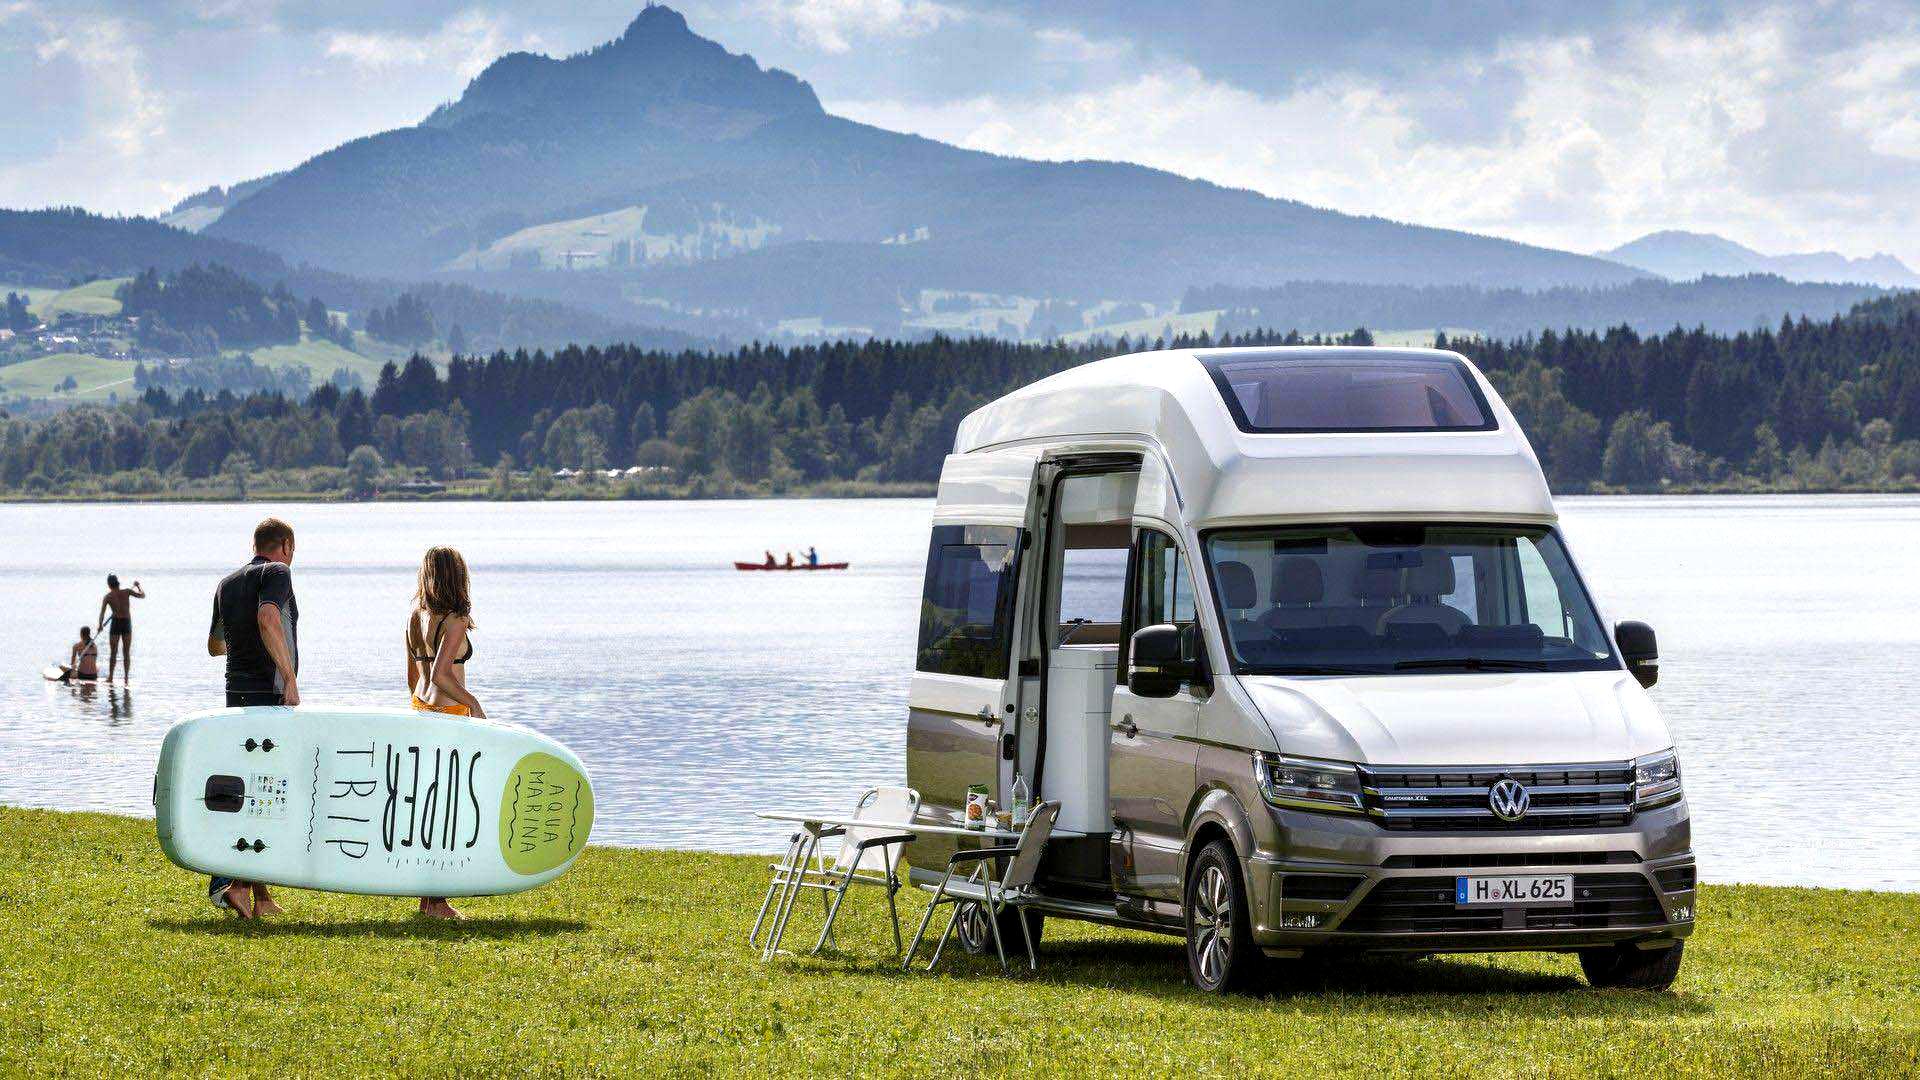 VW Grand California'da Rahat Yaşama Dair Her Şey Var!